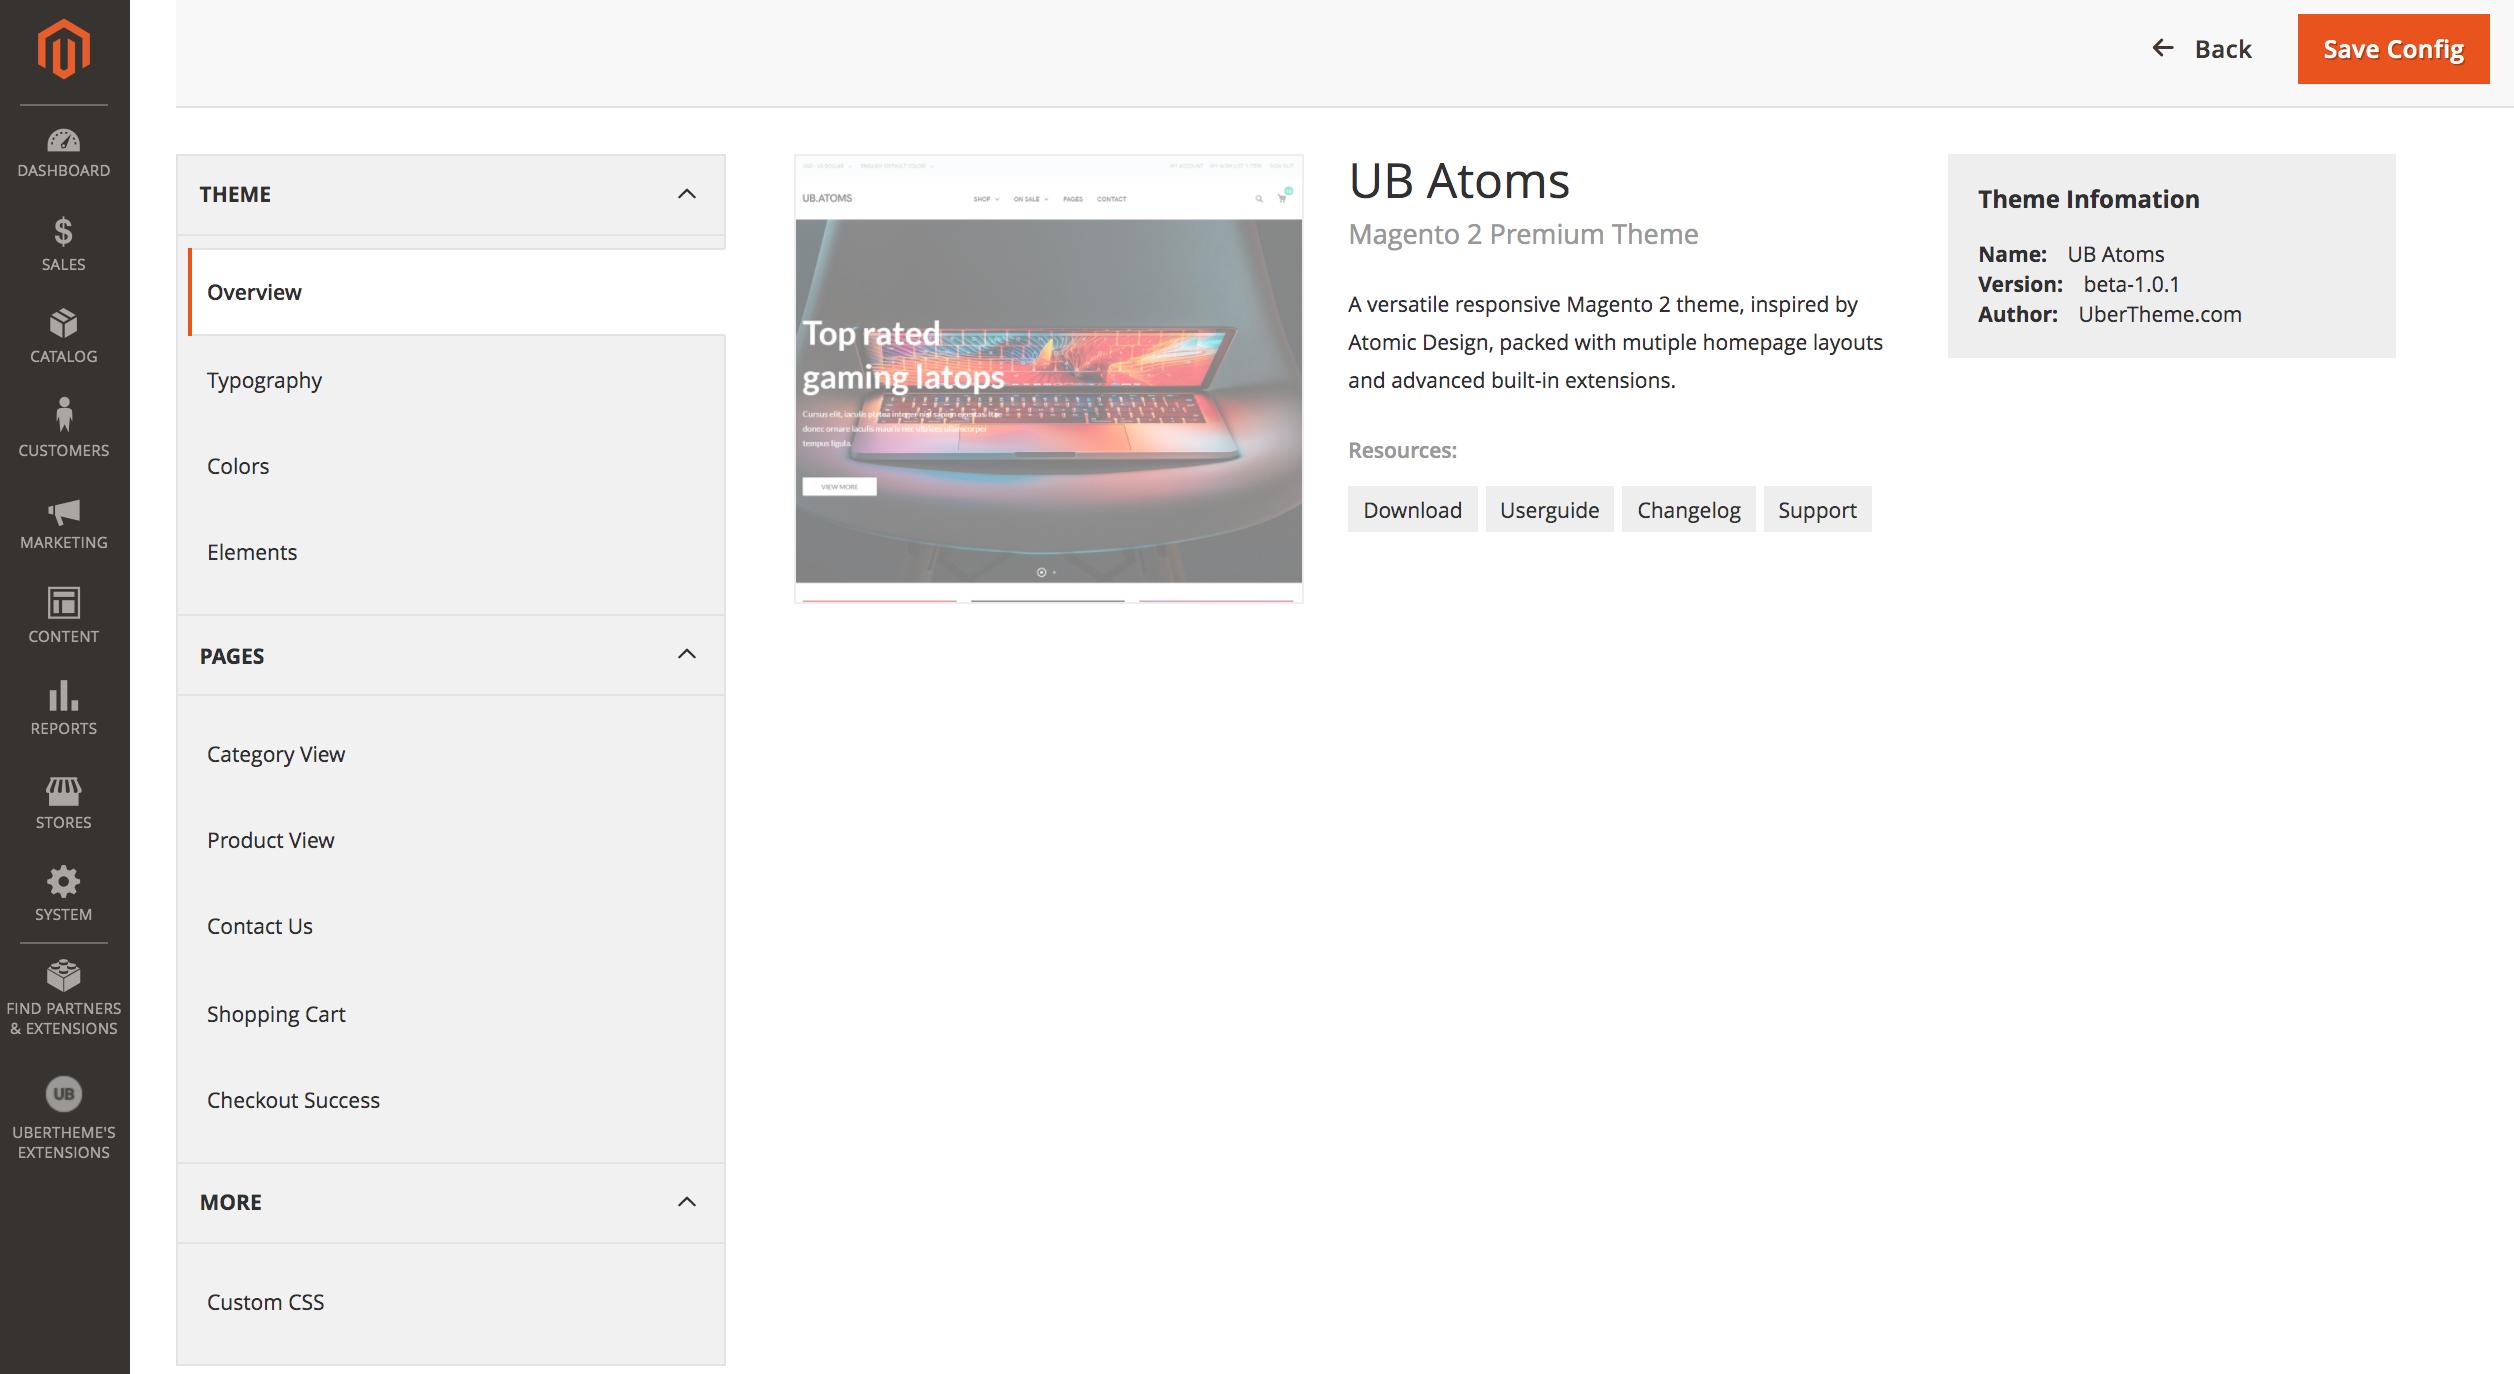 UB Atoms - Premium Magento 2 theme